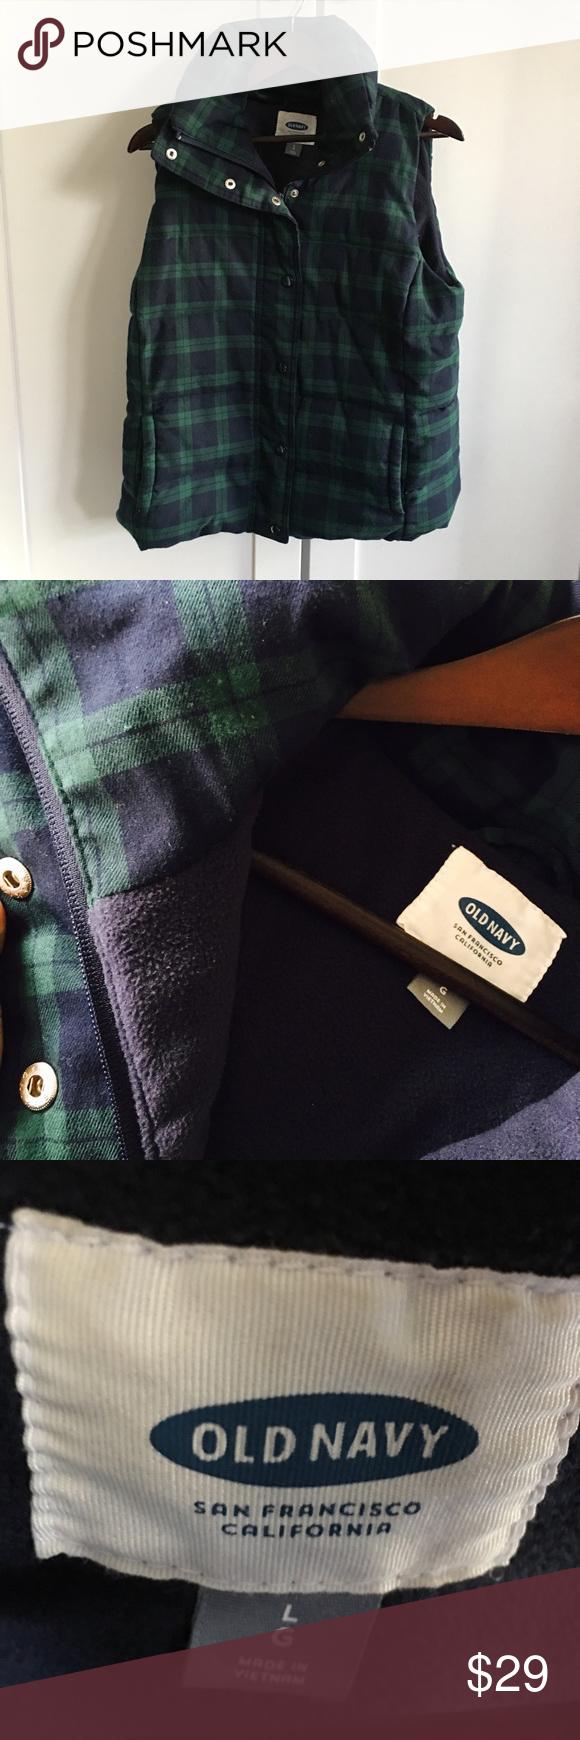 Hunter Green & Navy Plaid Fleece-lined Cozy Vest Hunter Green & Navy Plaid Fleece-lined